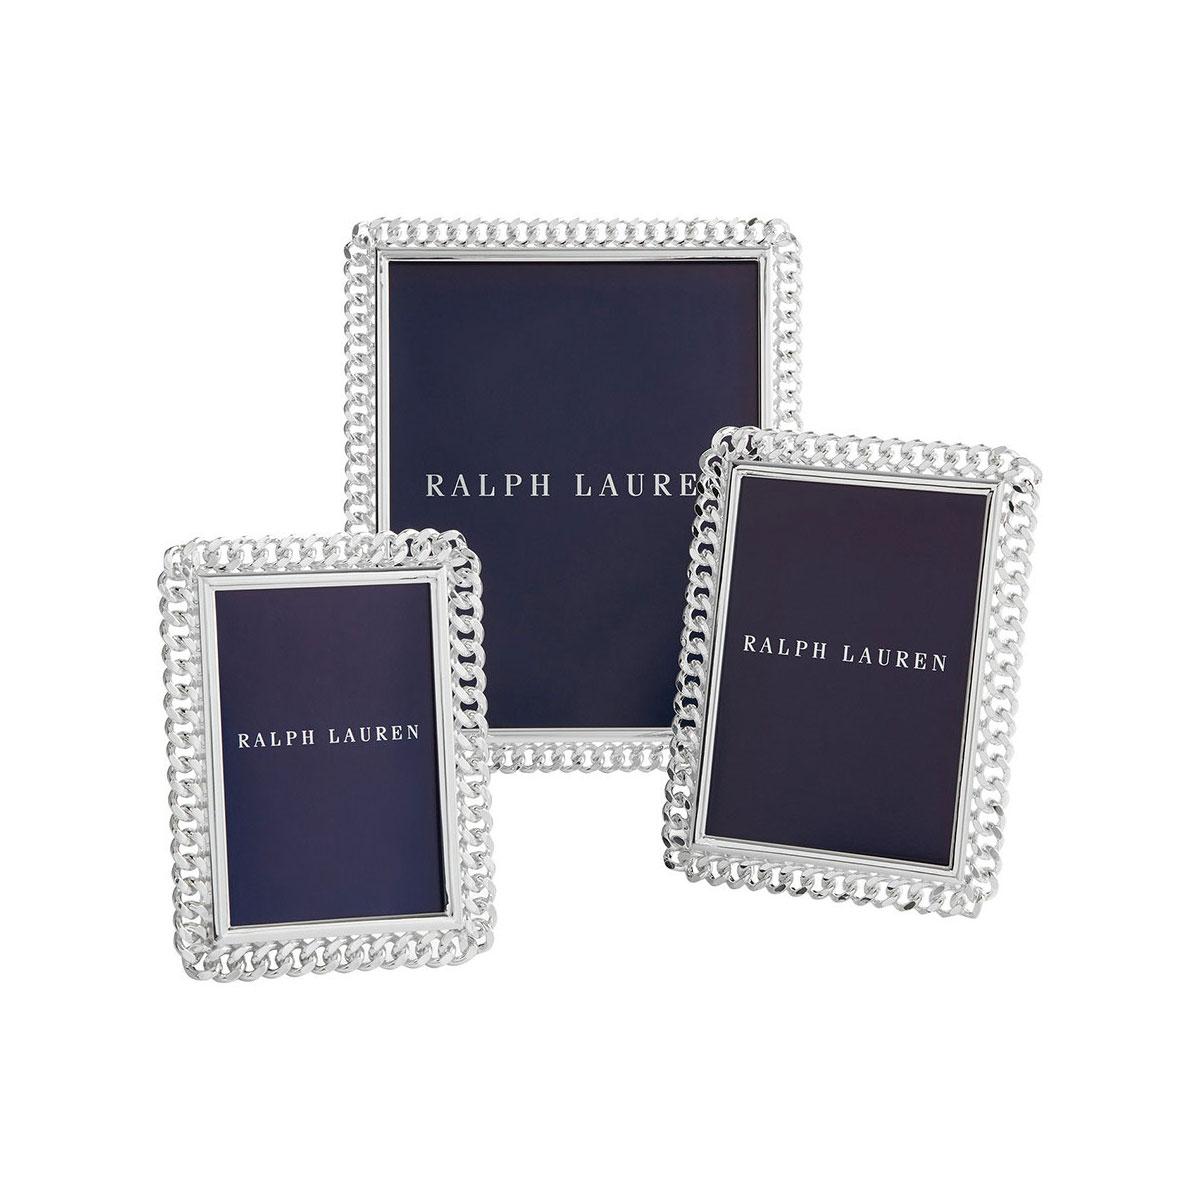 "Ralph Lauren Blake 8x10"" Picture Frame"